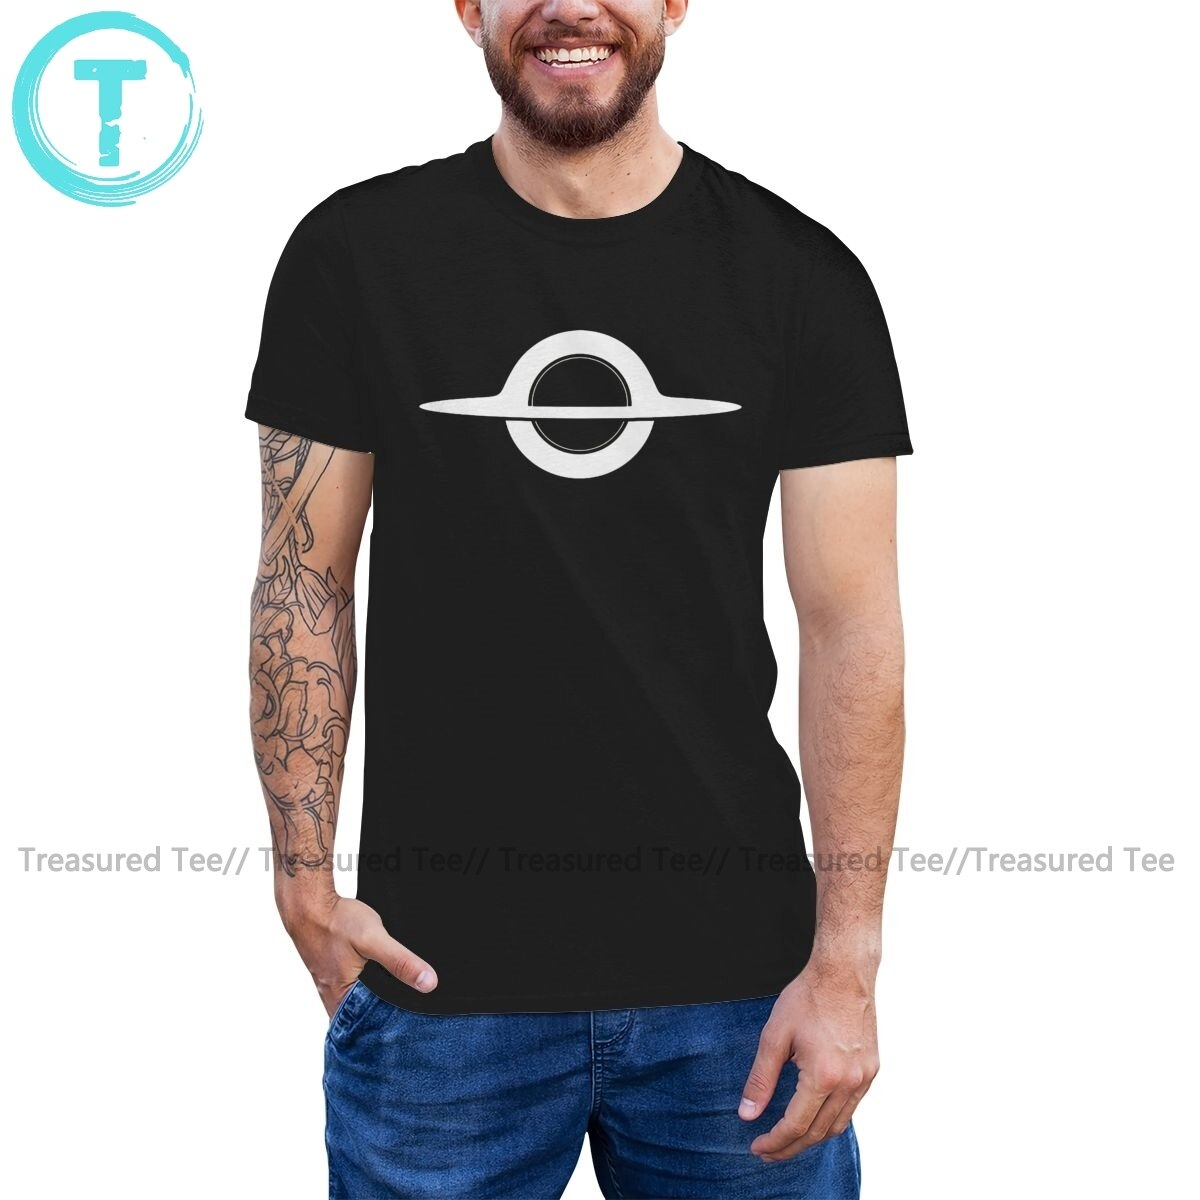 Camiseta interestelar, camiseta Interstellar de estilo minimalista, camiseta gráfica de manga corta, Camiseta de algodón